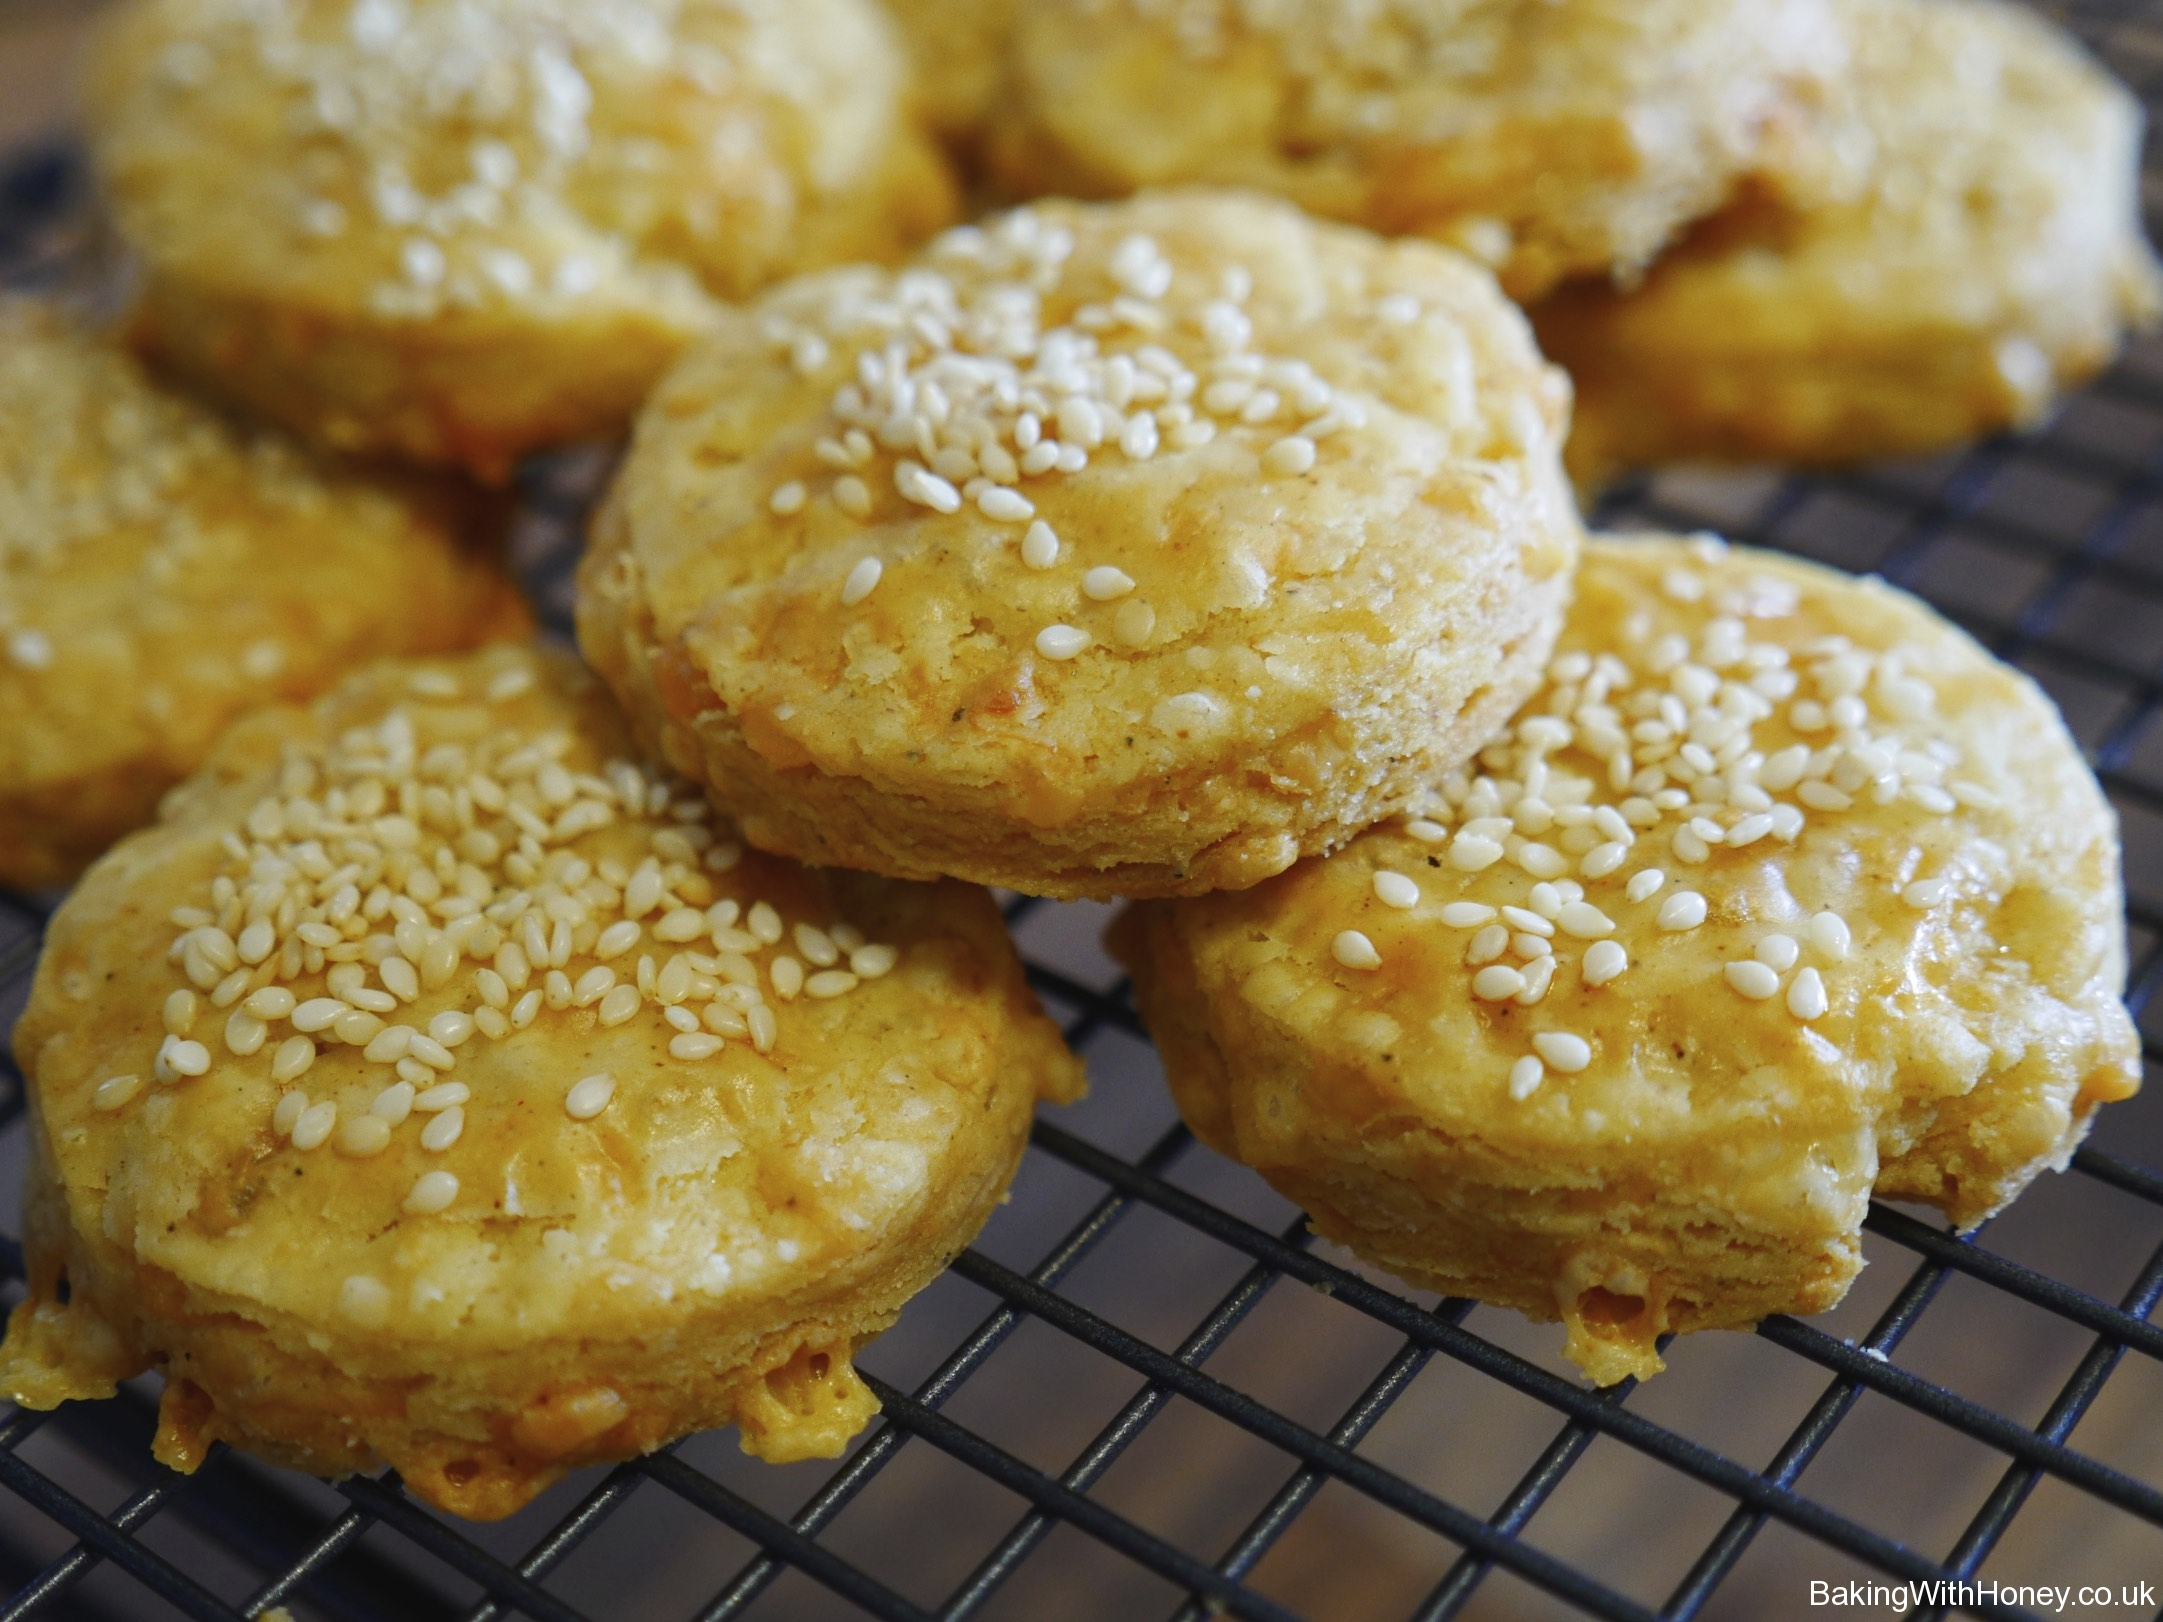 Summer Holidays Week 2: Cheesy Biscuits